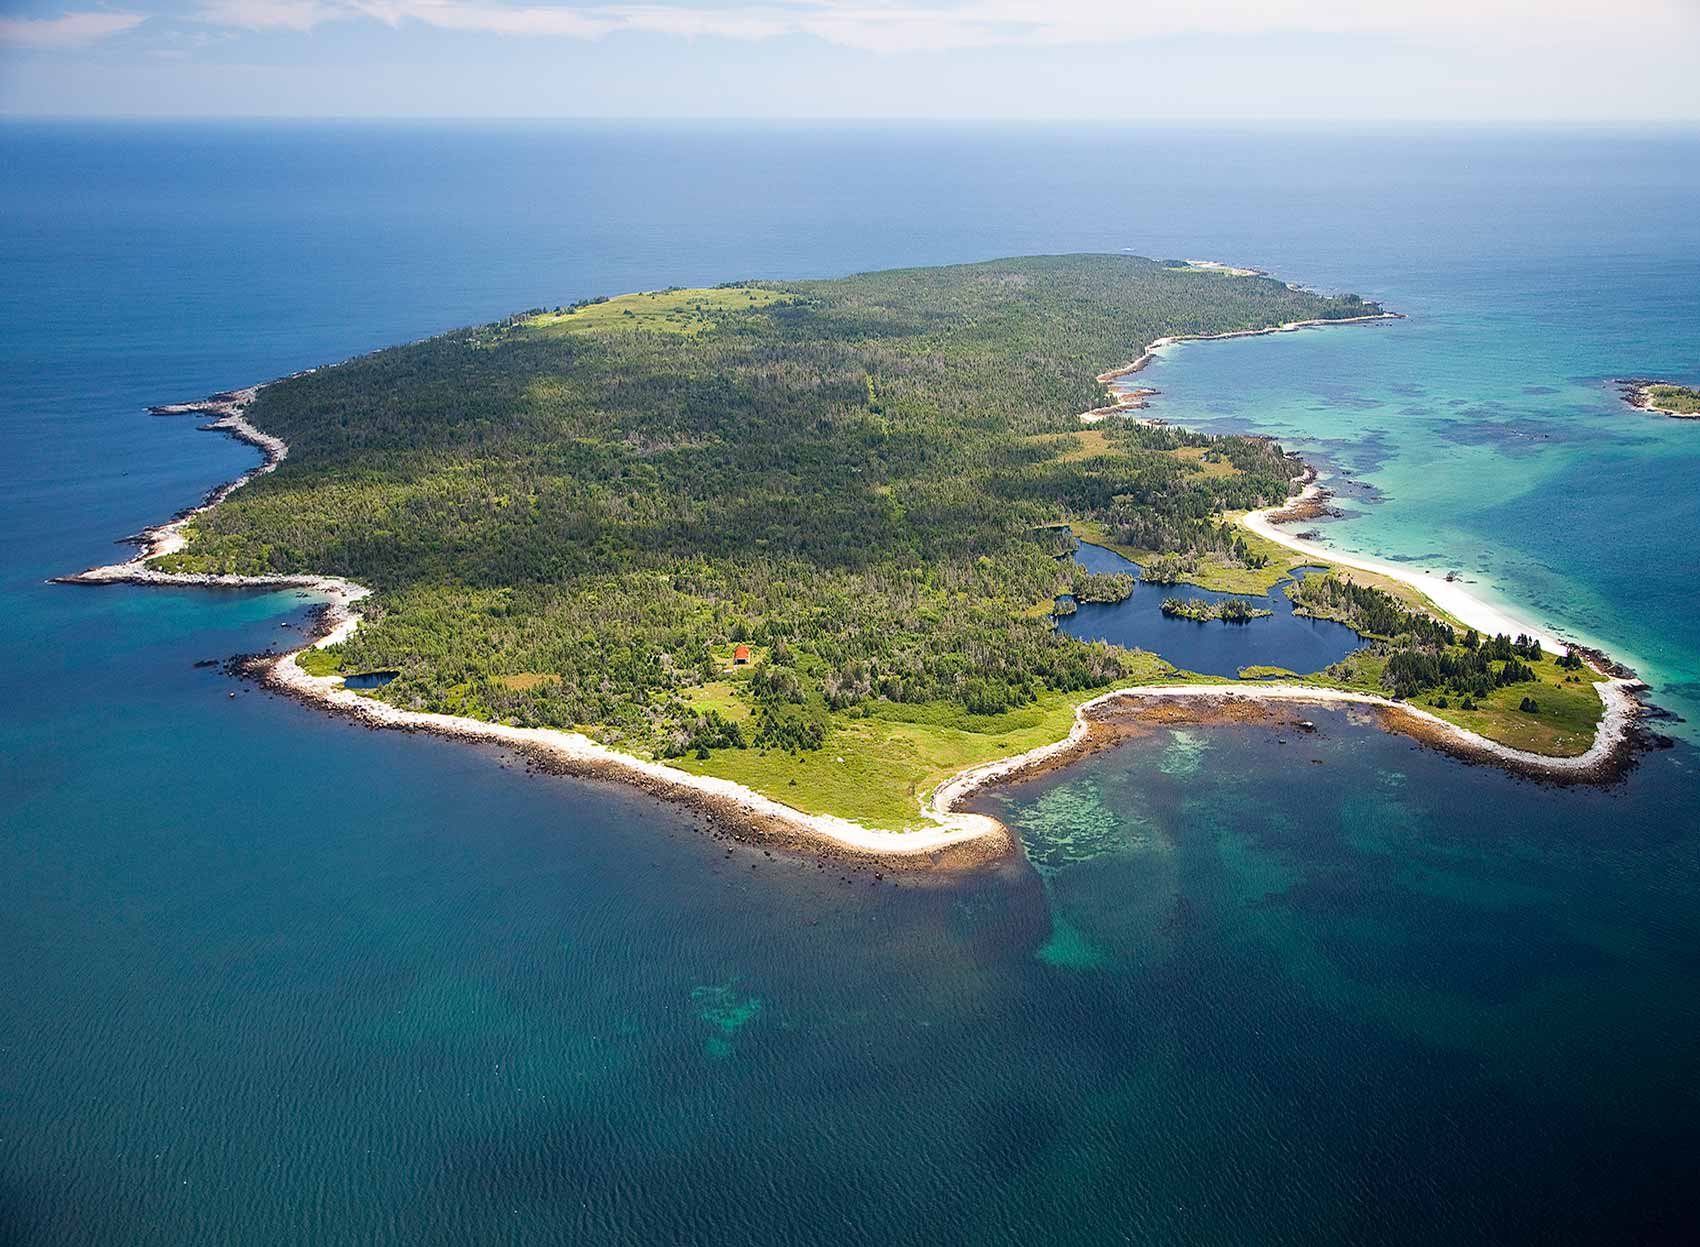 Indian Bedrooms Vladi Private Islands Private Islands For Sale Private